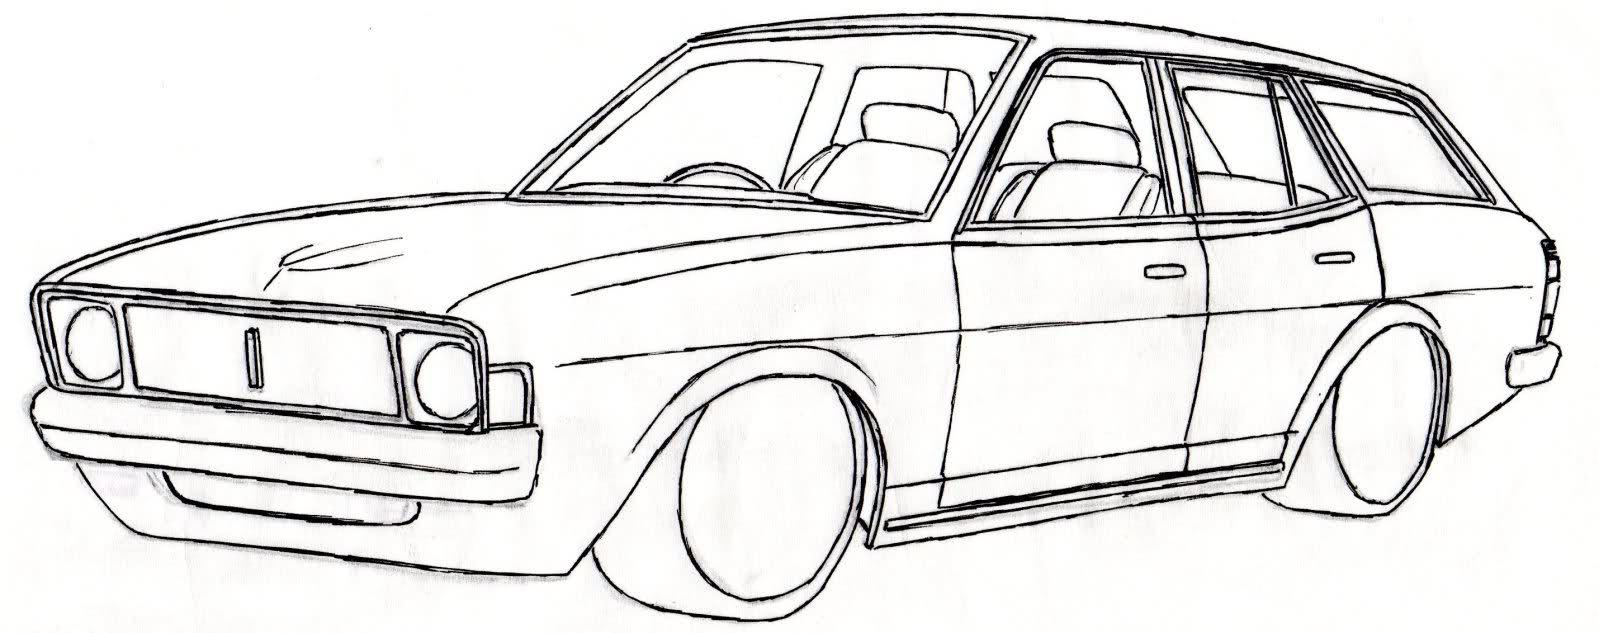 Drawn vehicle drift Galant Sigma GC/GD draw car